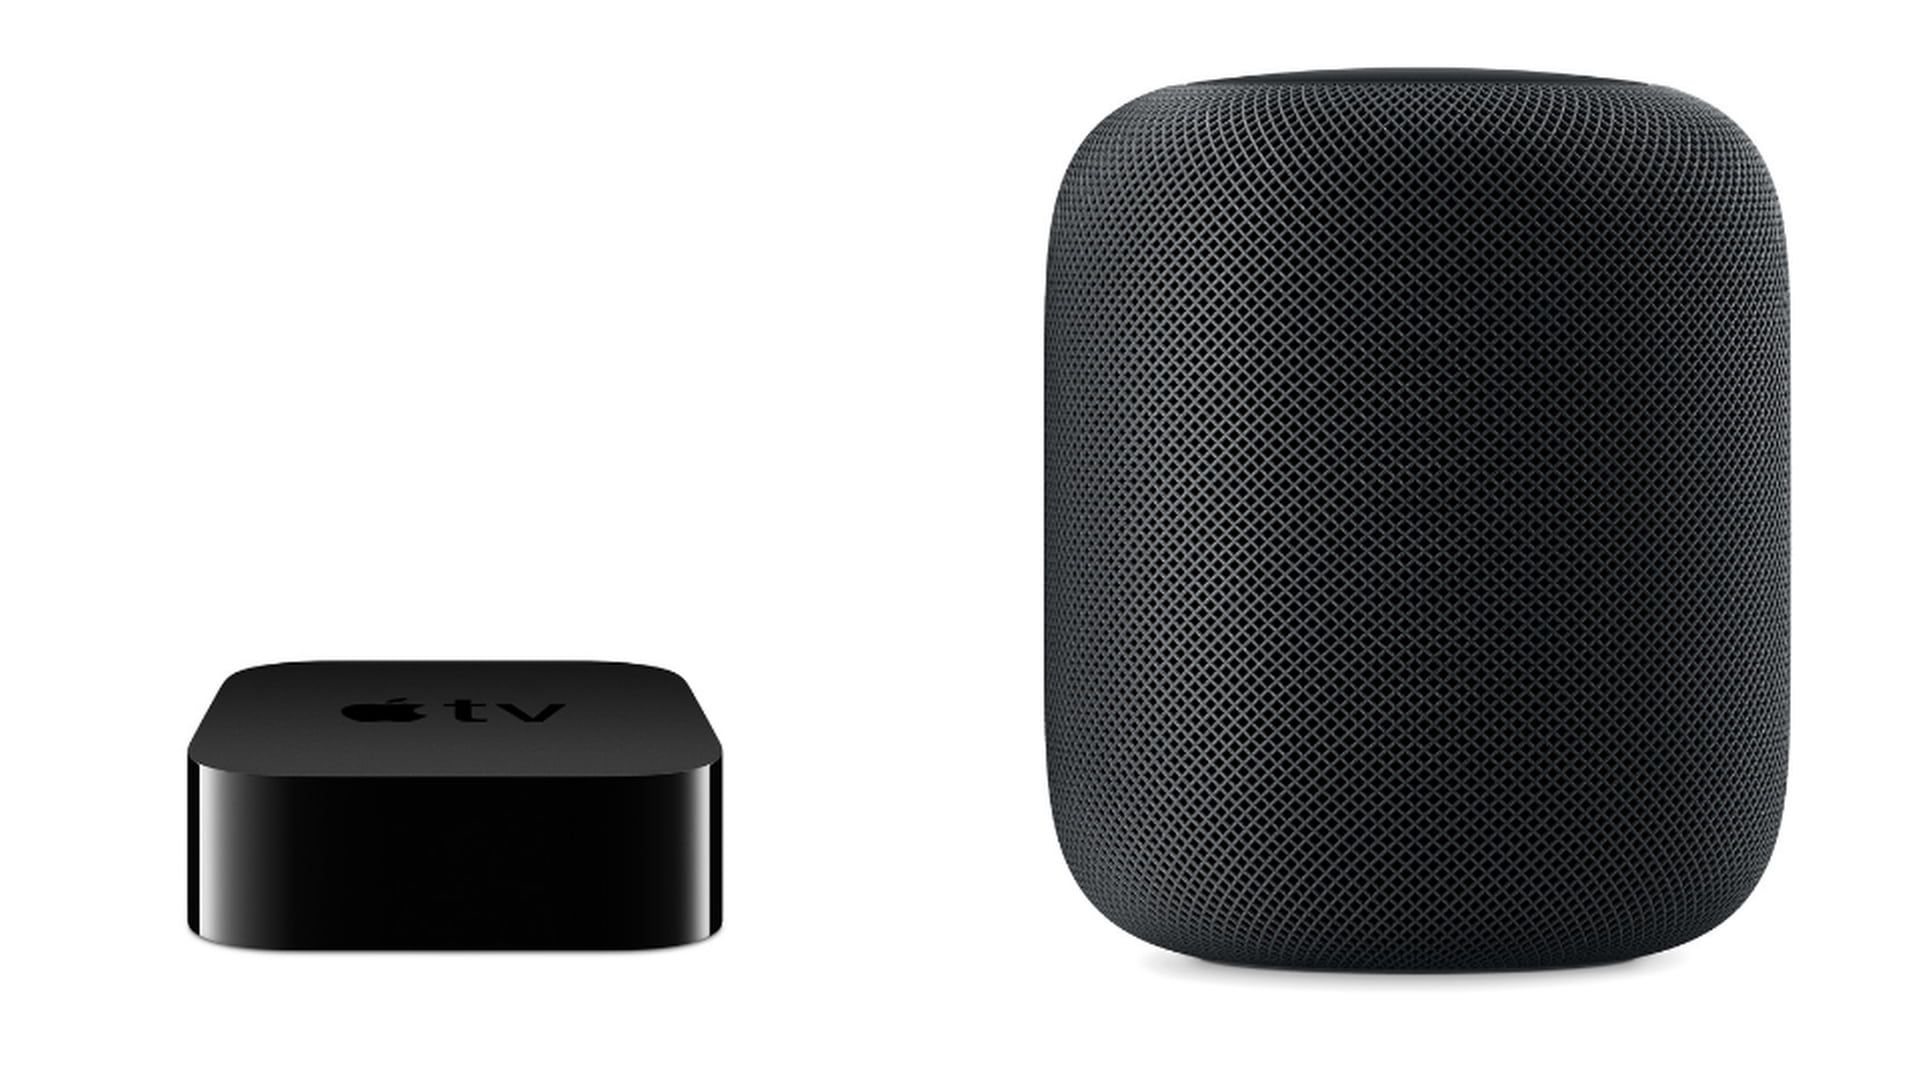 Apple bez pomysłu na smartdom i połączone Apple TV/HomePod za 2 lata